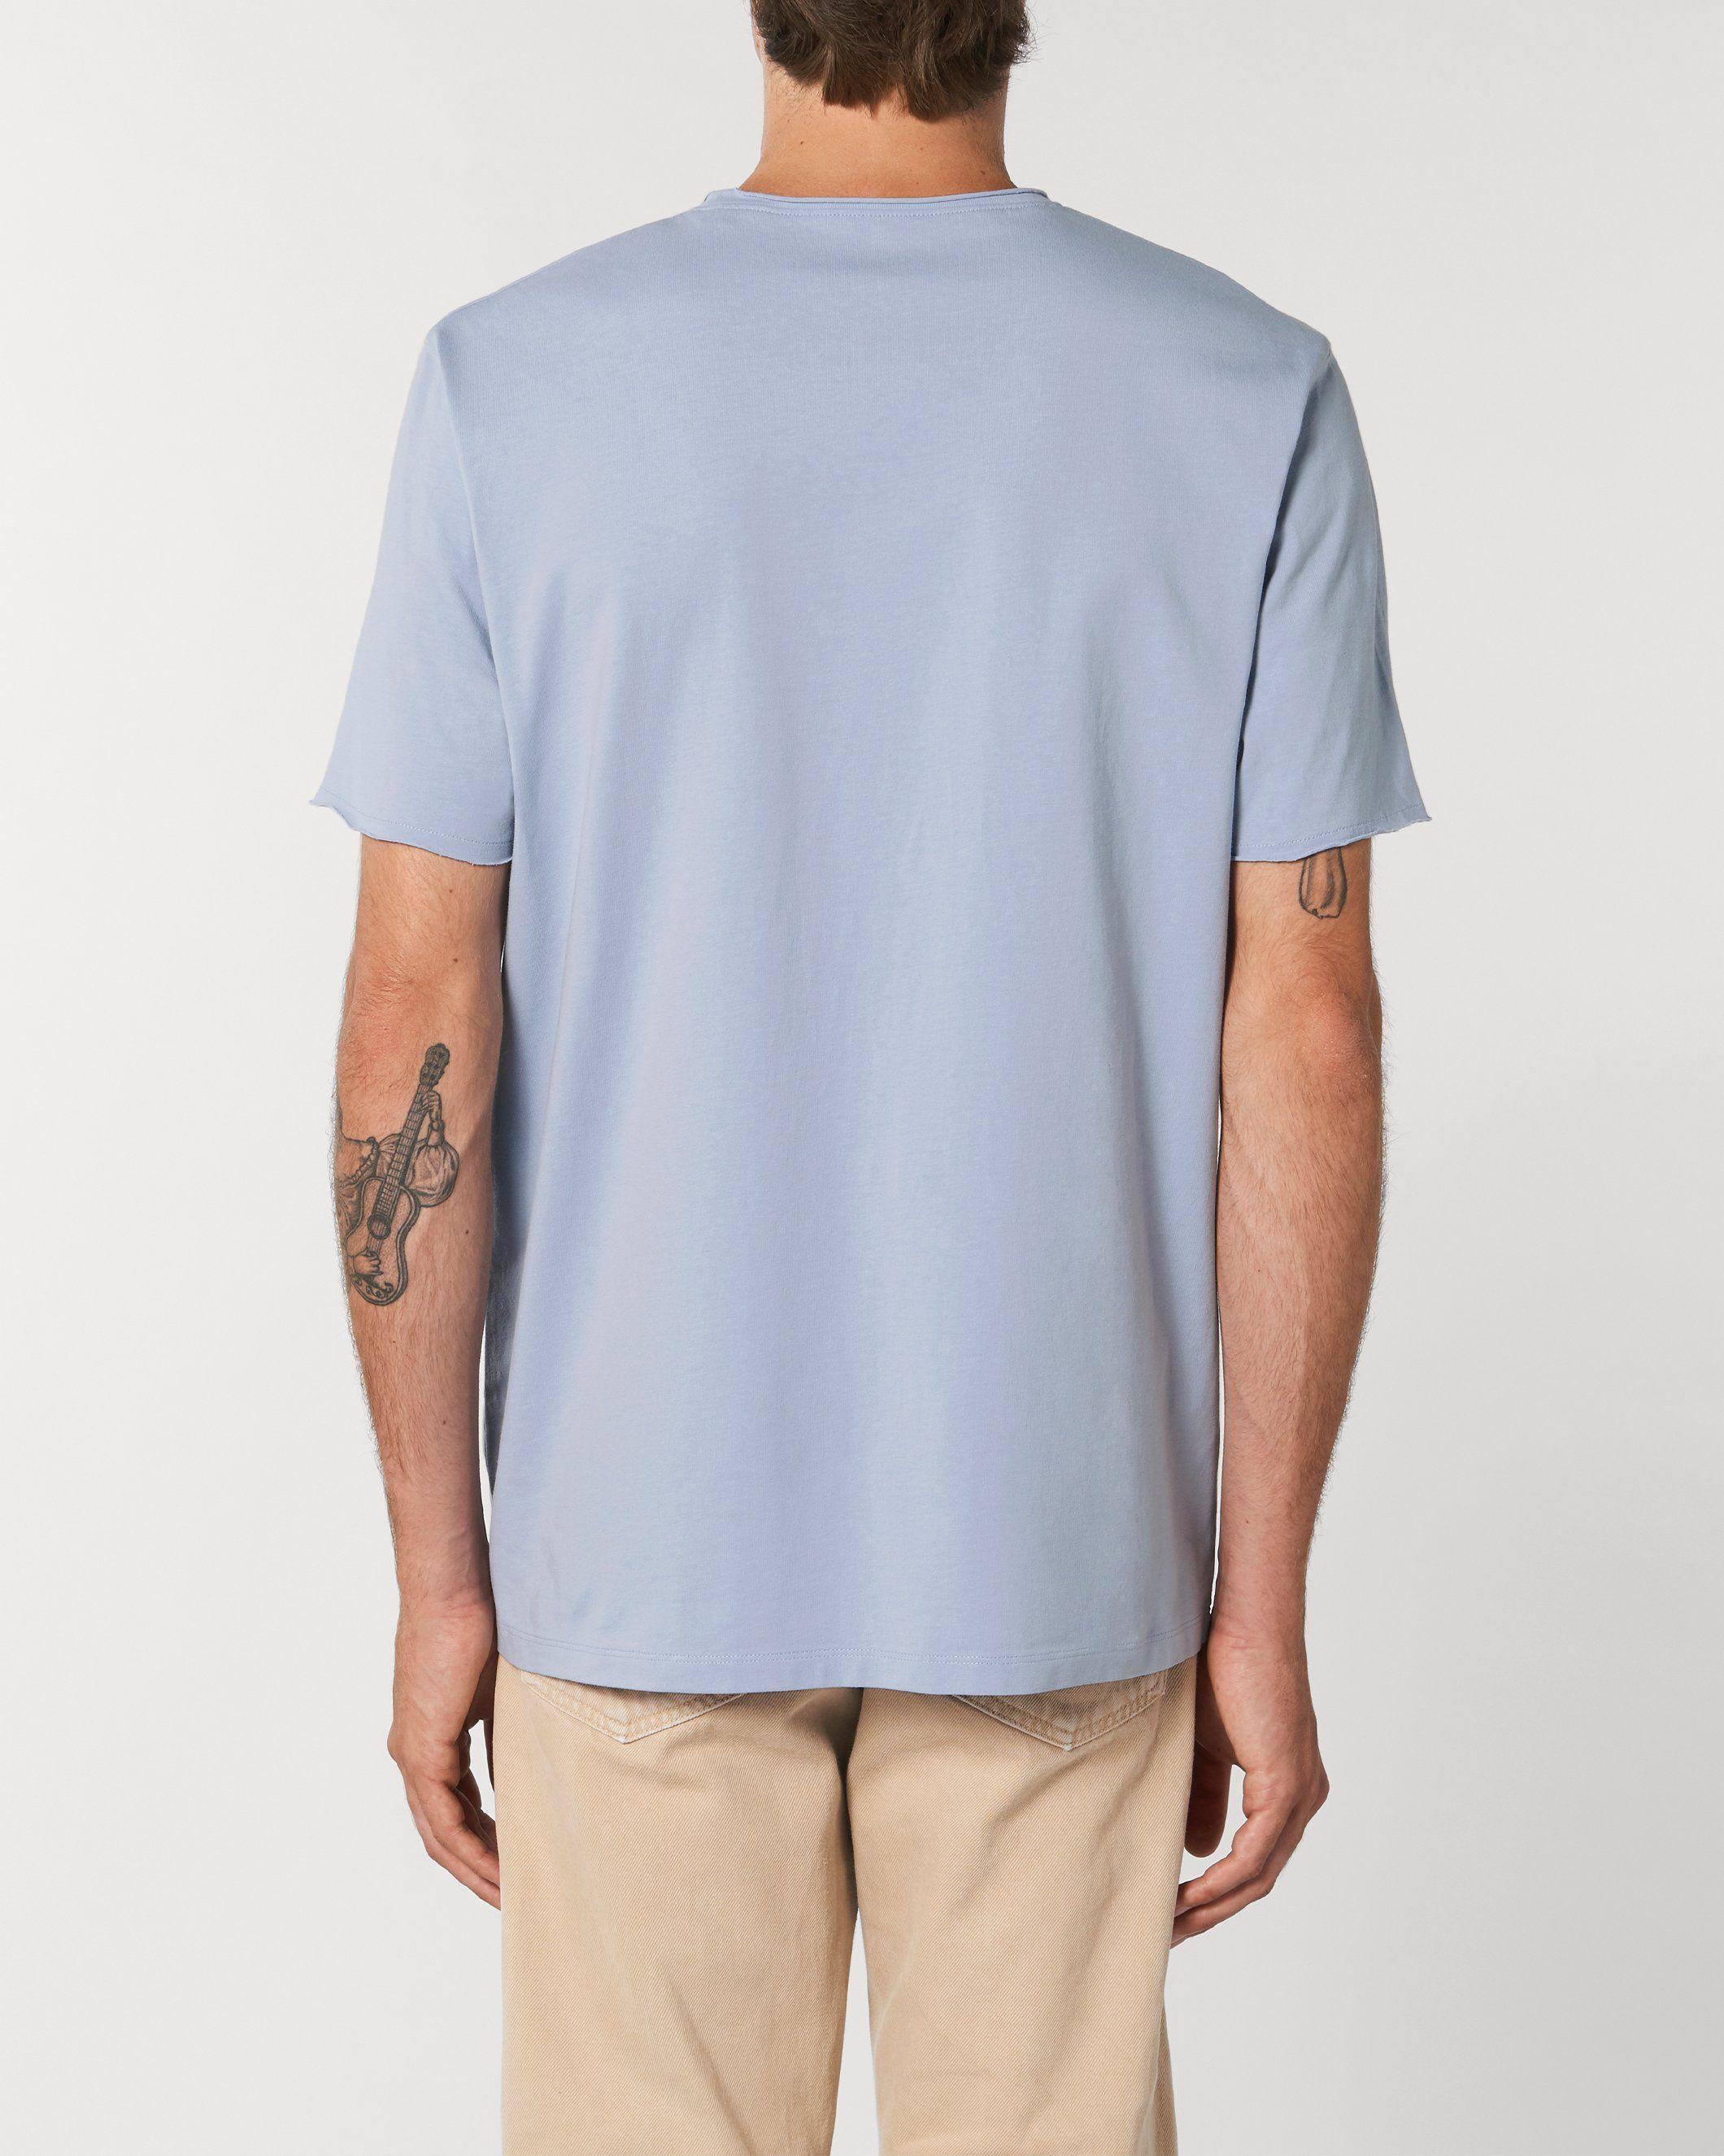 Guru Unisex Raw Edge T-Shirt in Blue